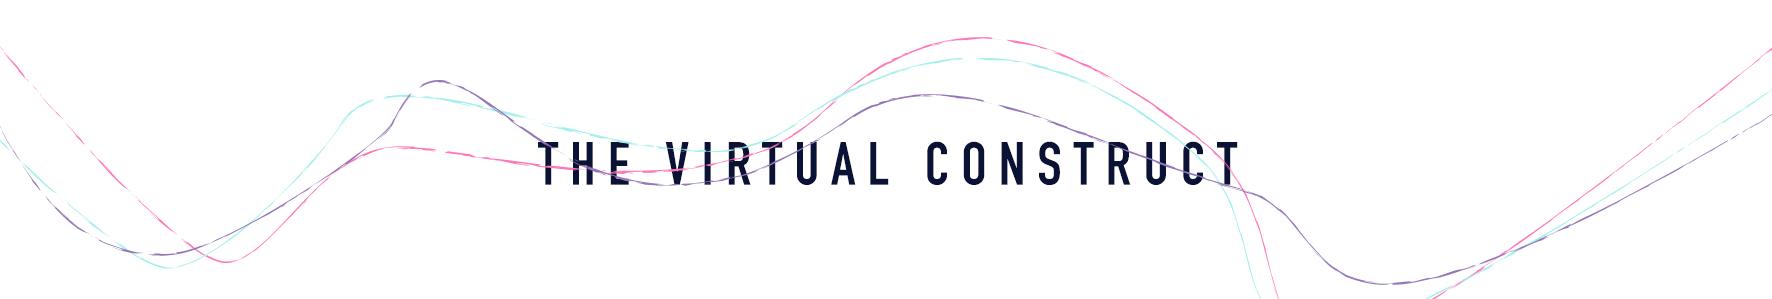 the virtual construct.jpg